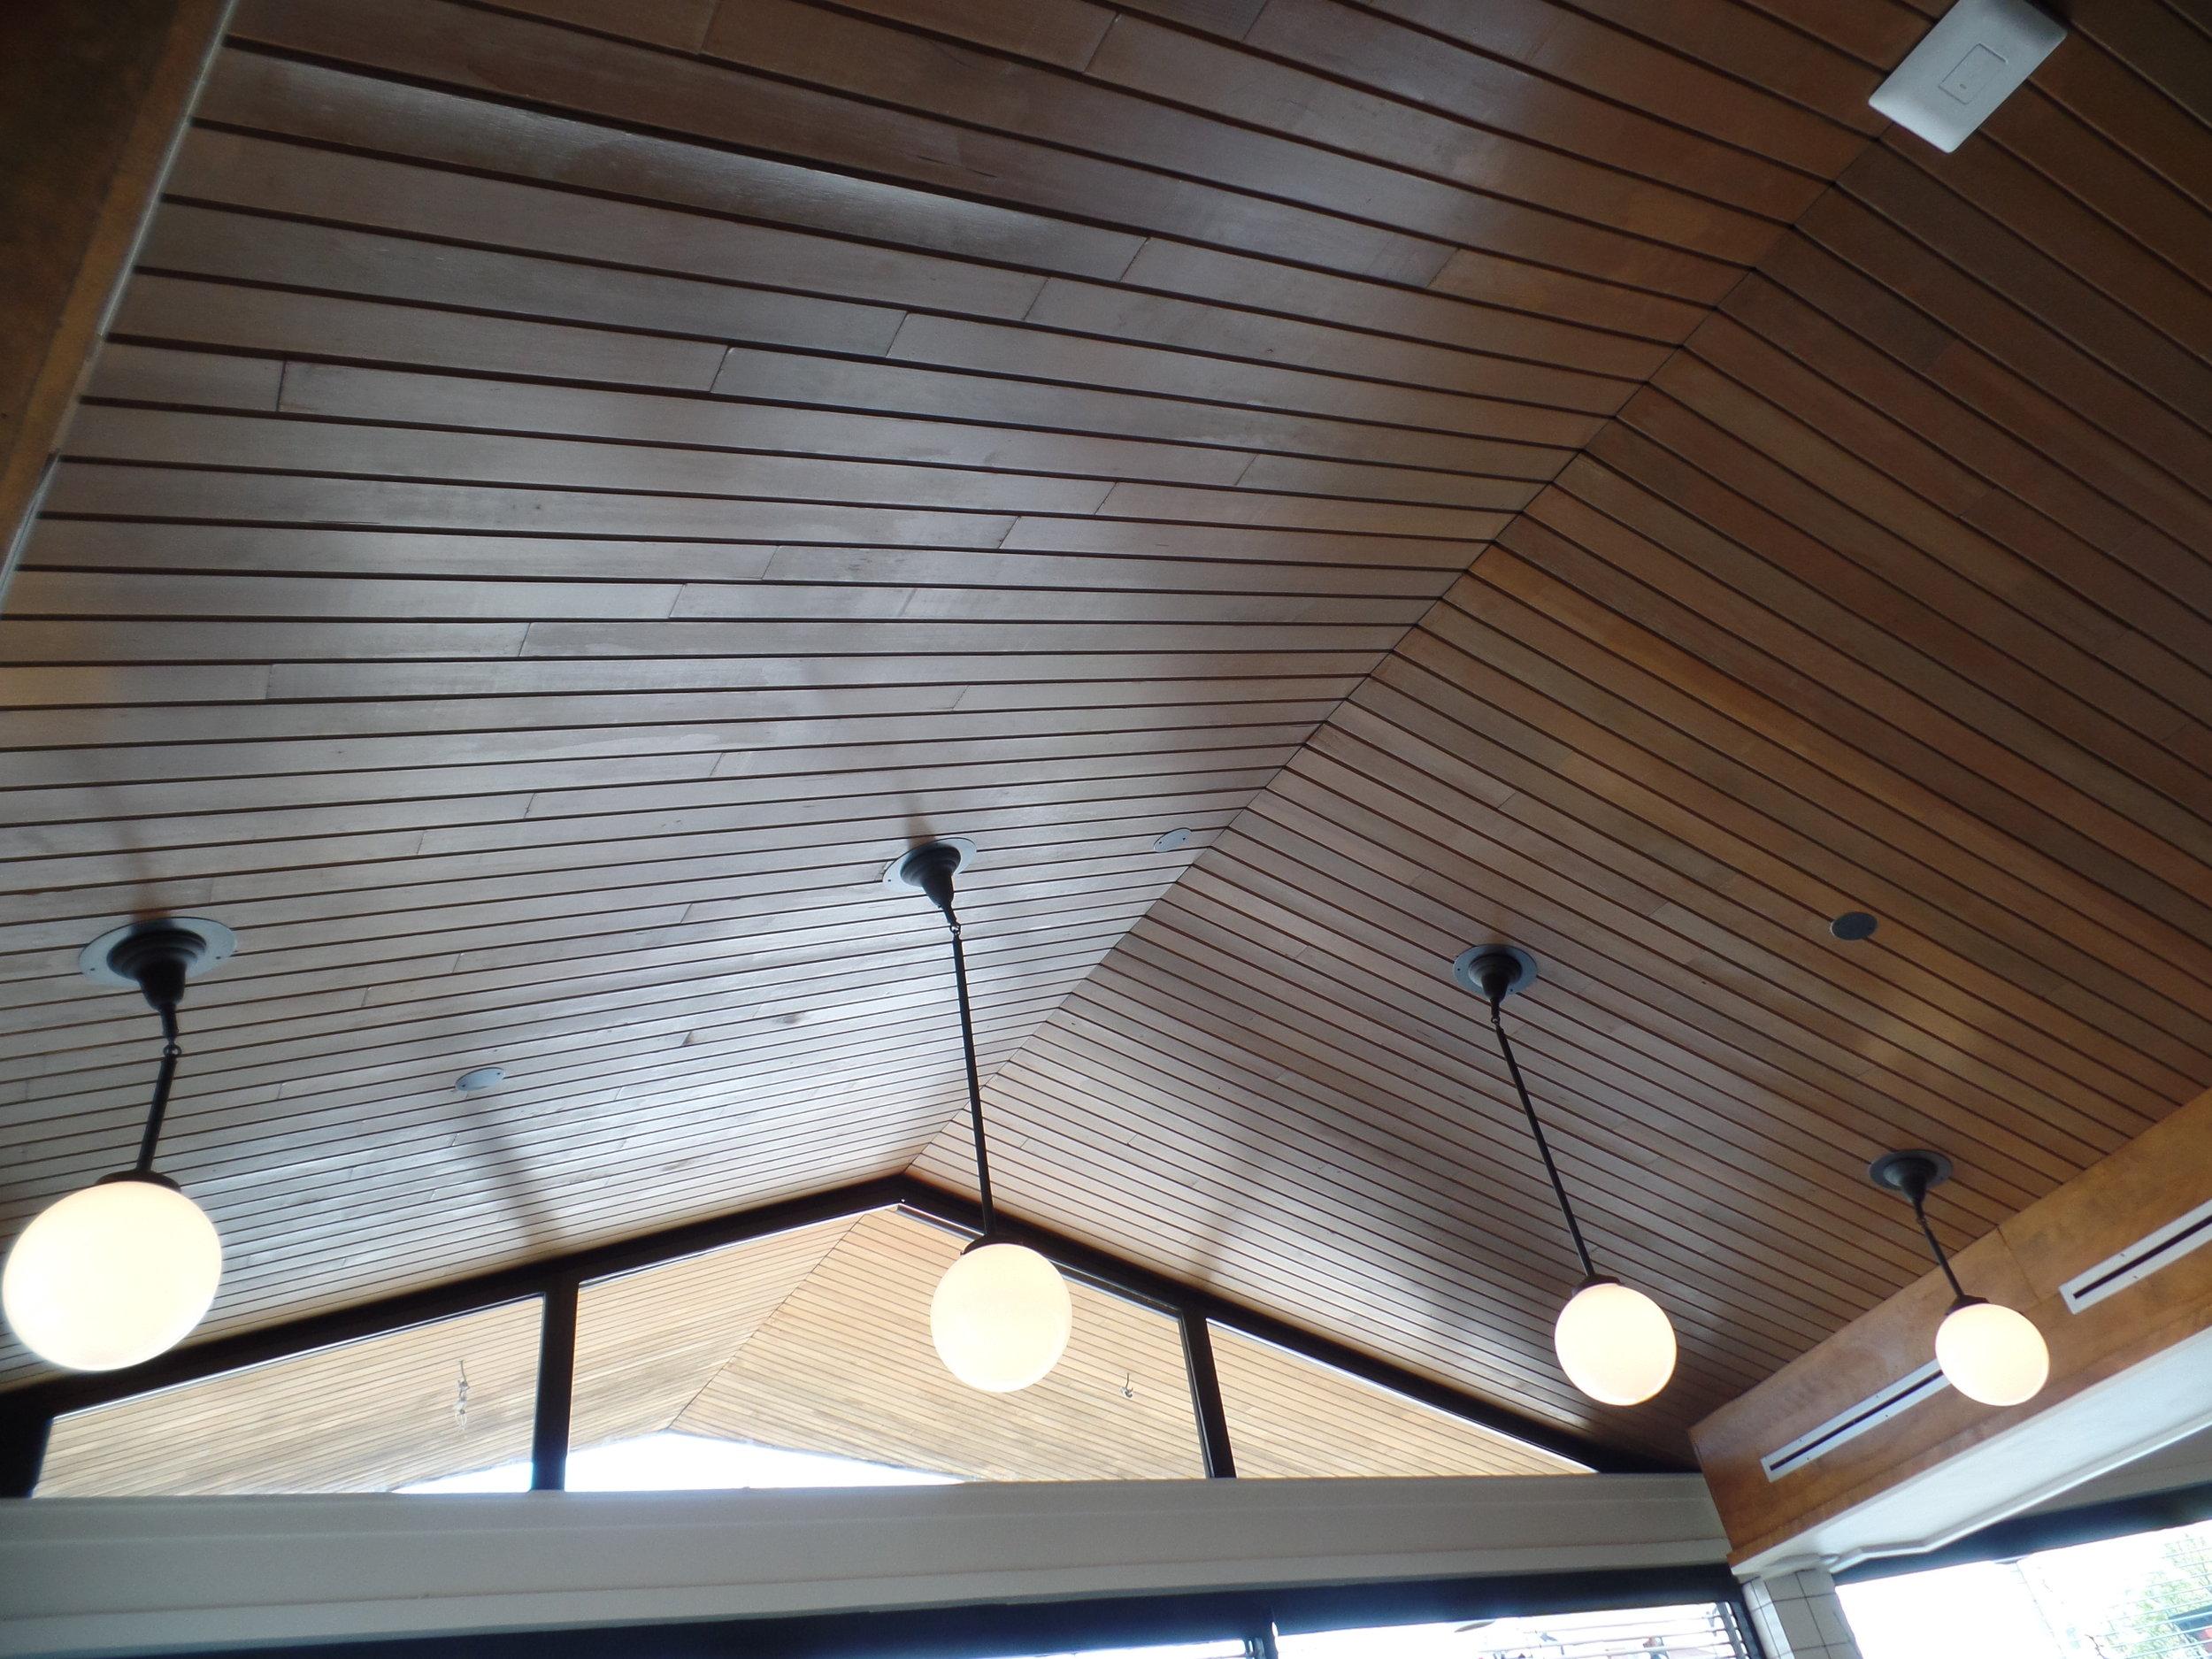 Woodfords_F&B_ceiling_2017.JPG